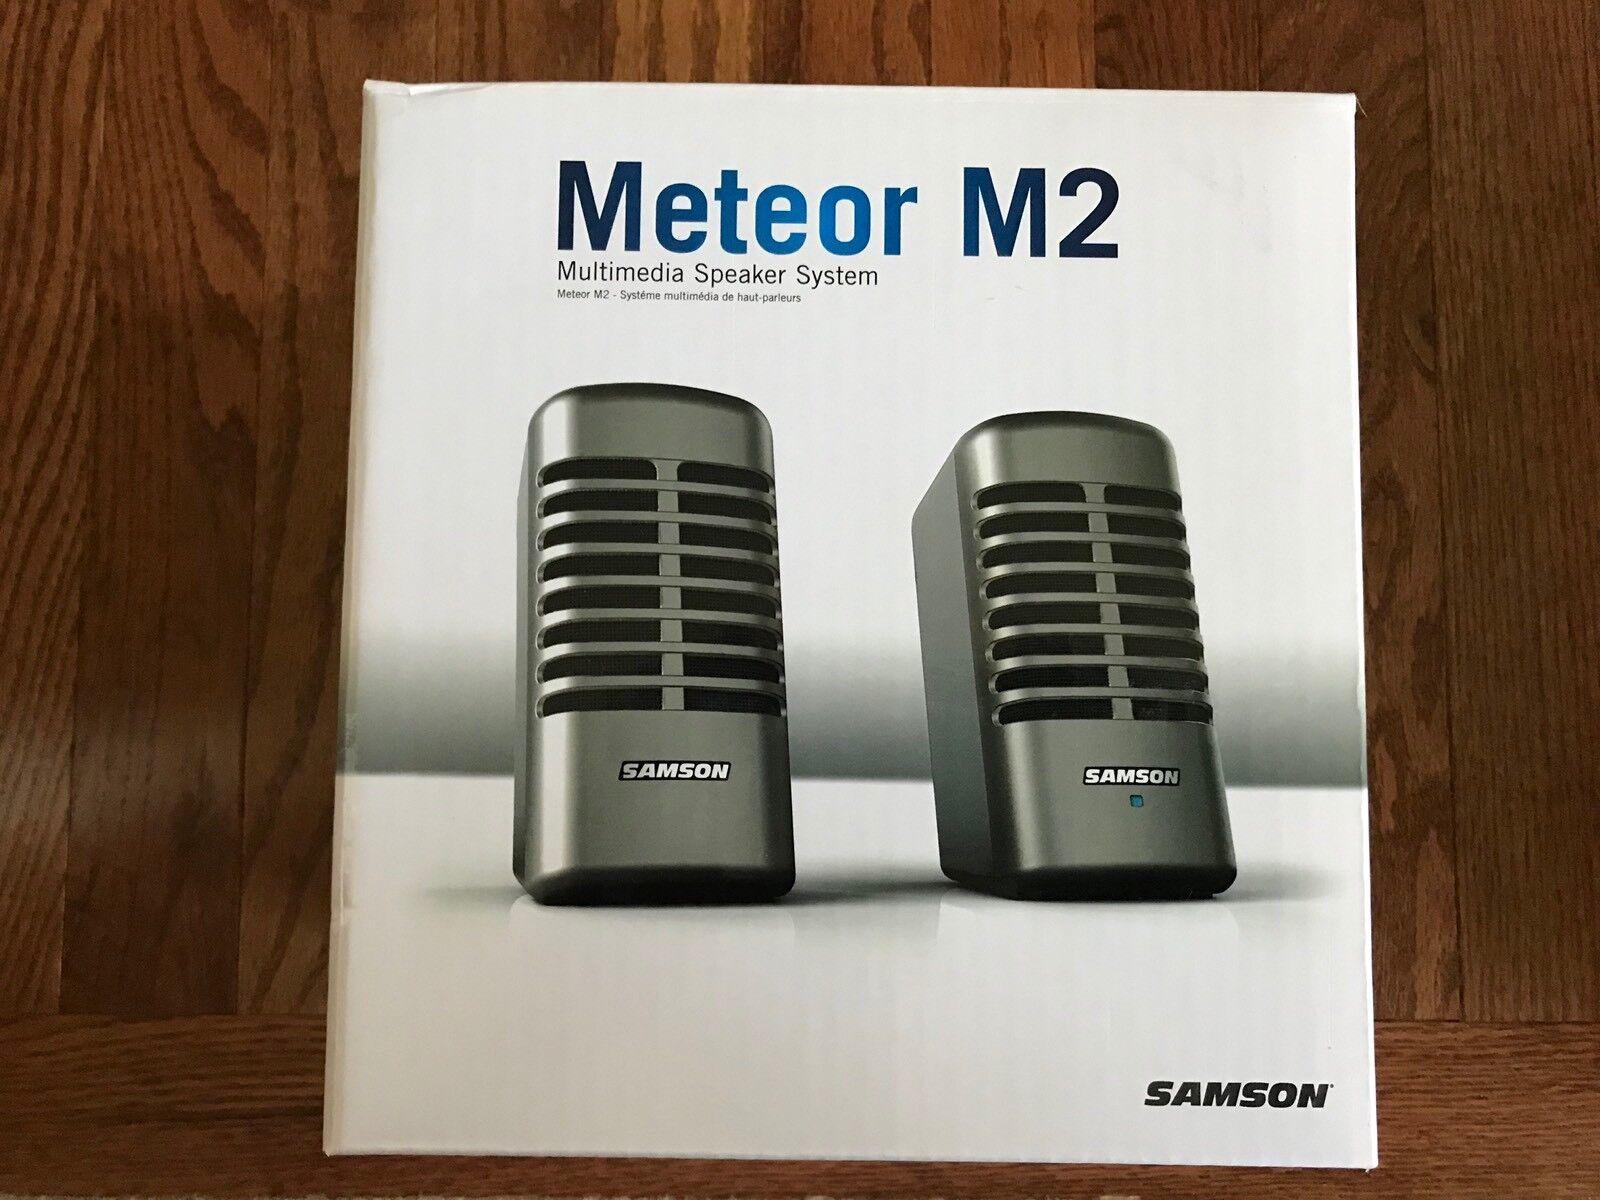 Samson Meteor M2 Multimedia Speaker System (Pair)